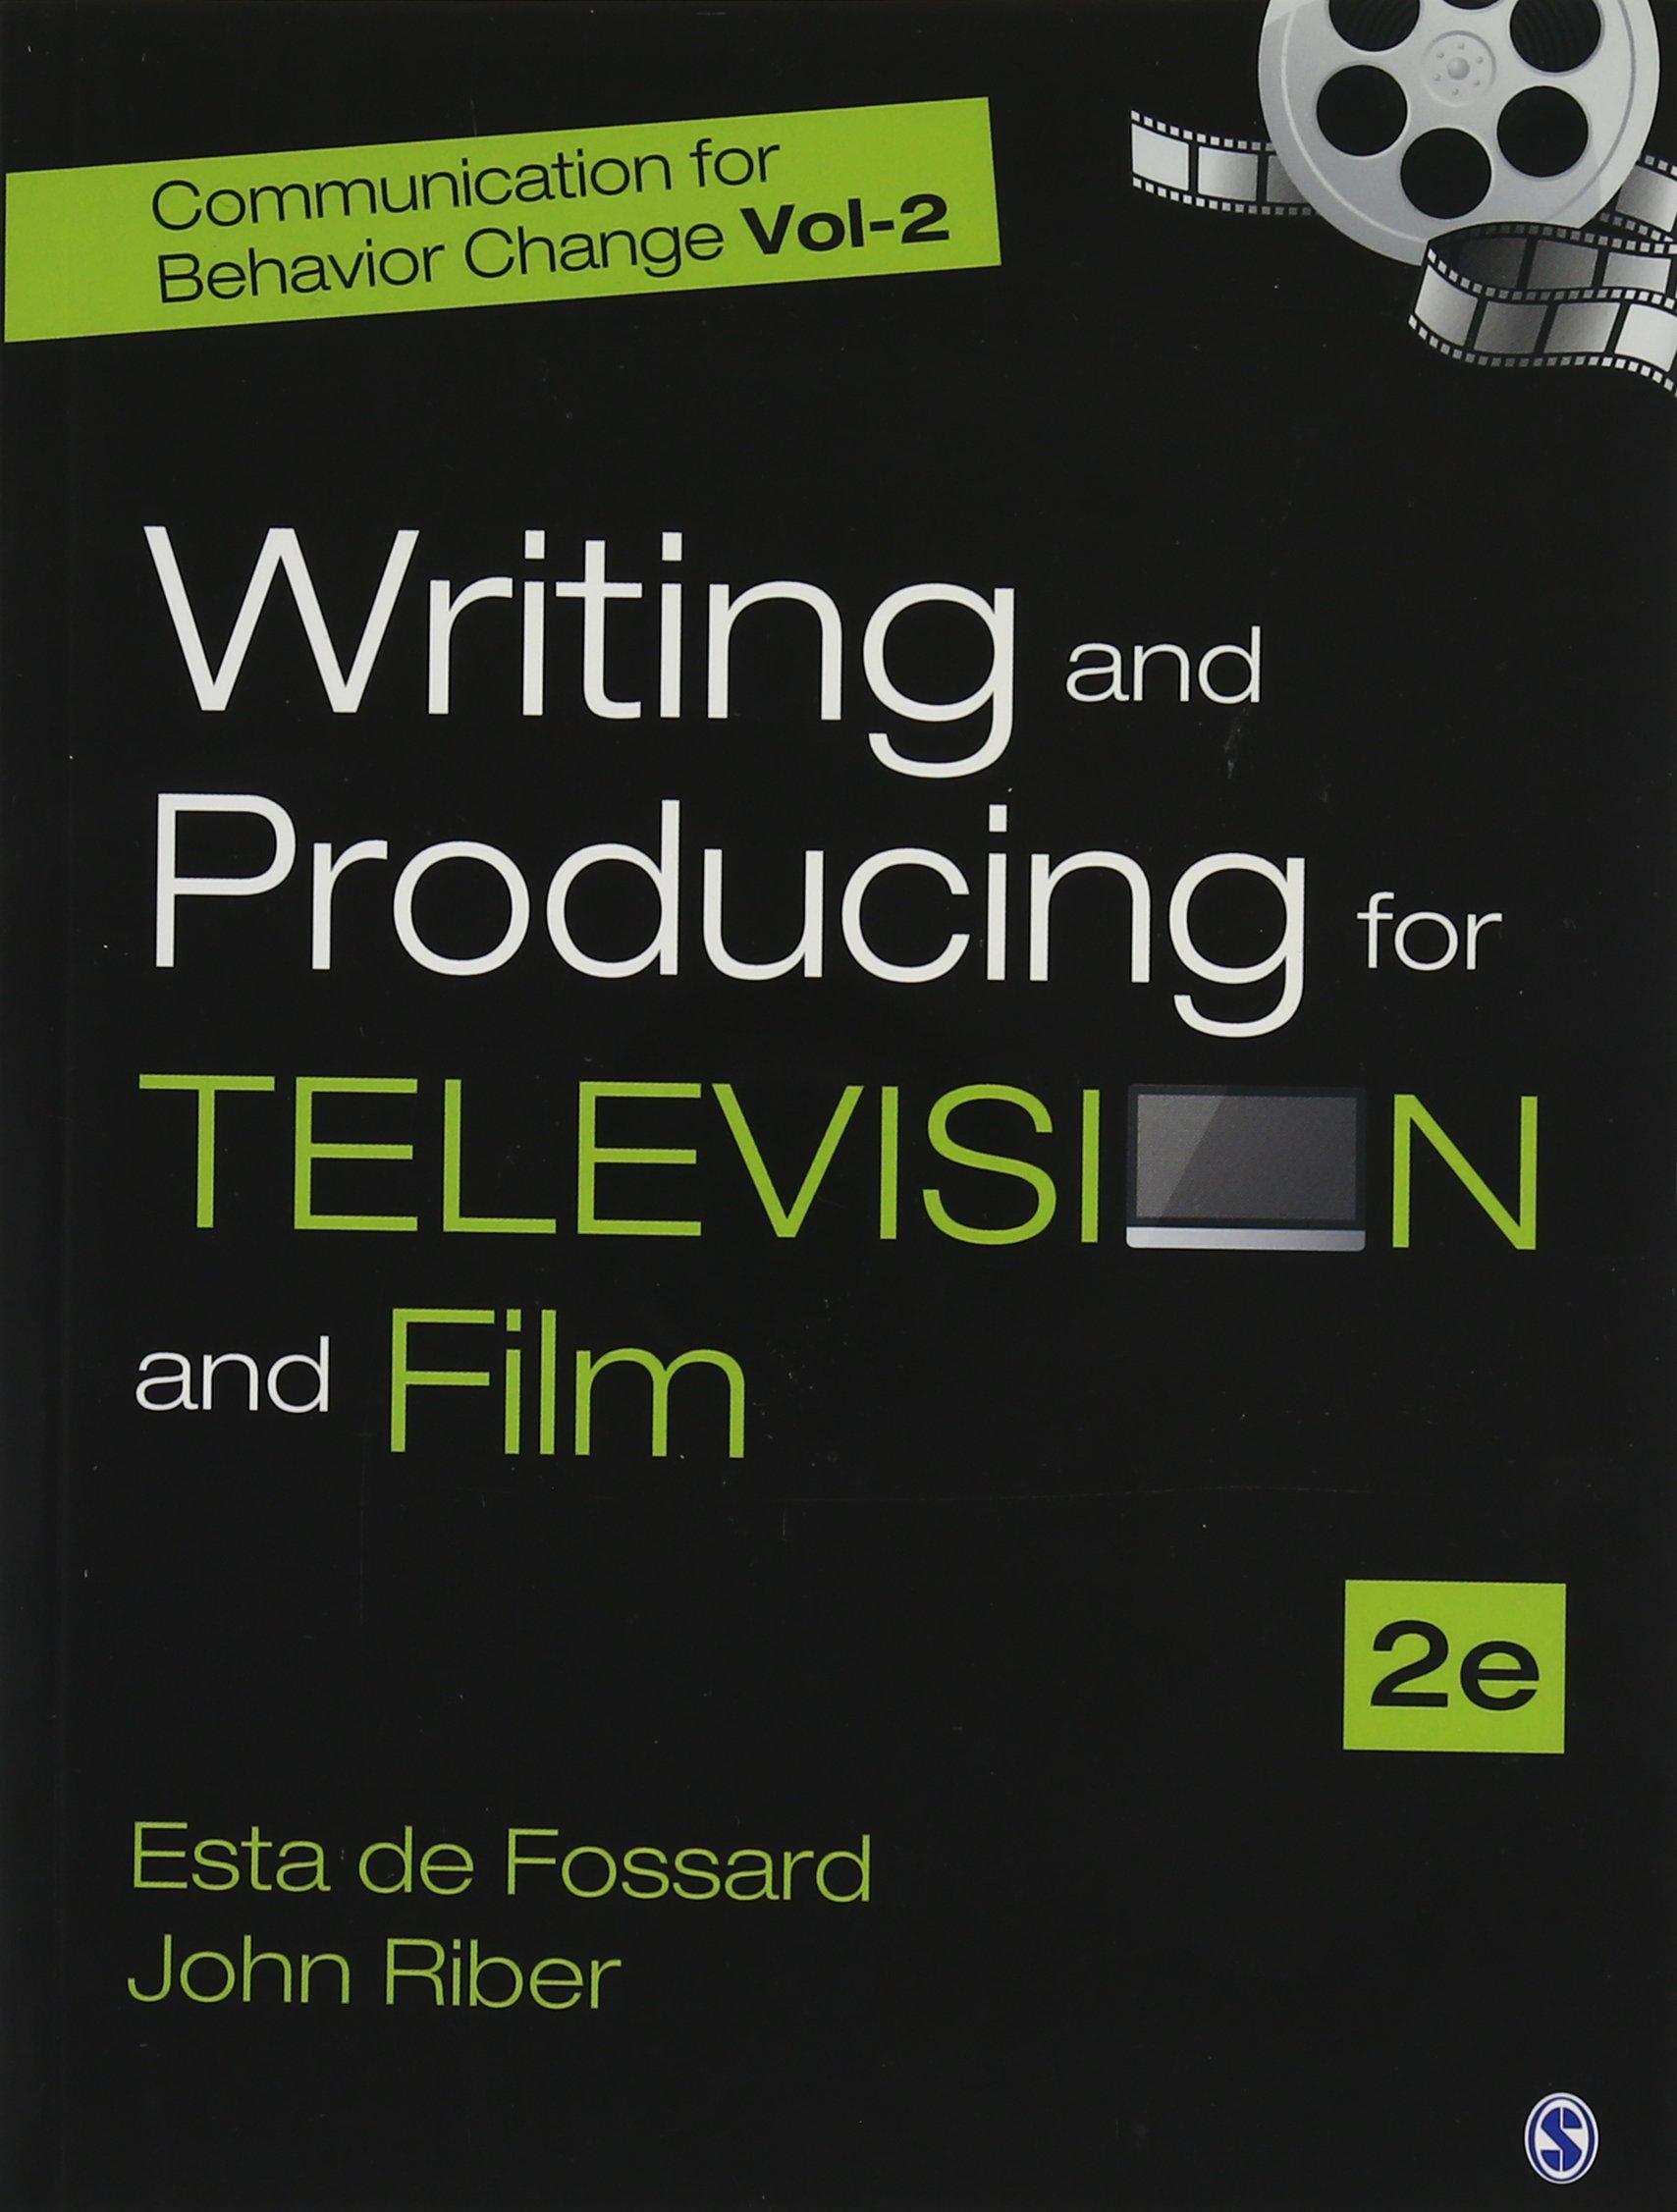 lmus school of film and television